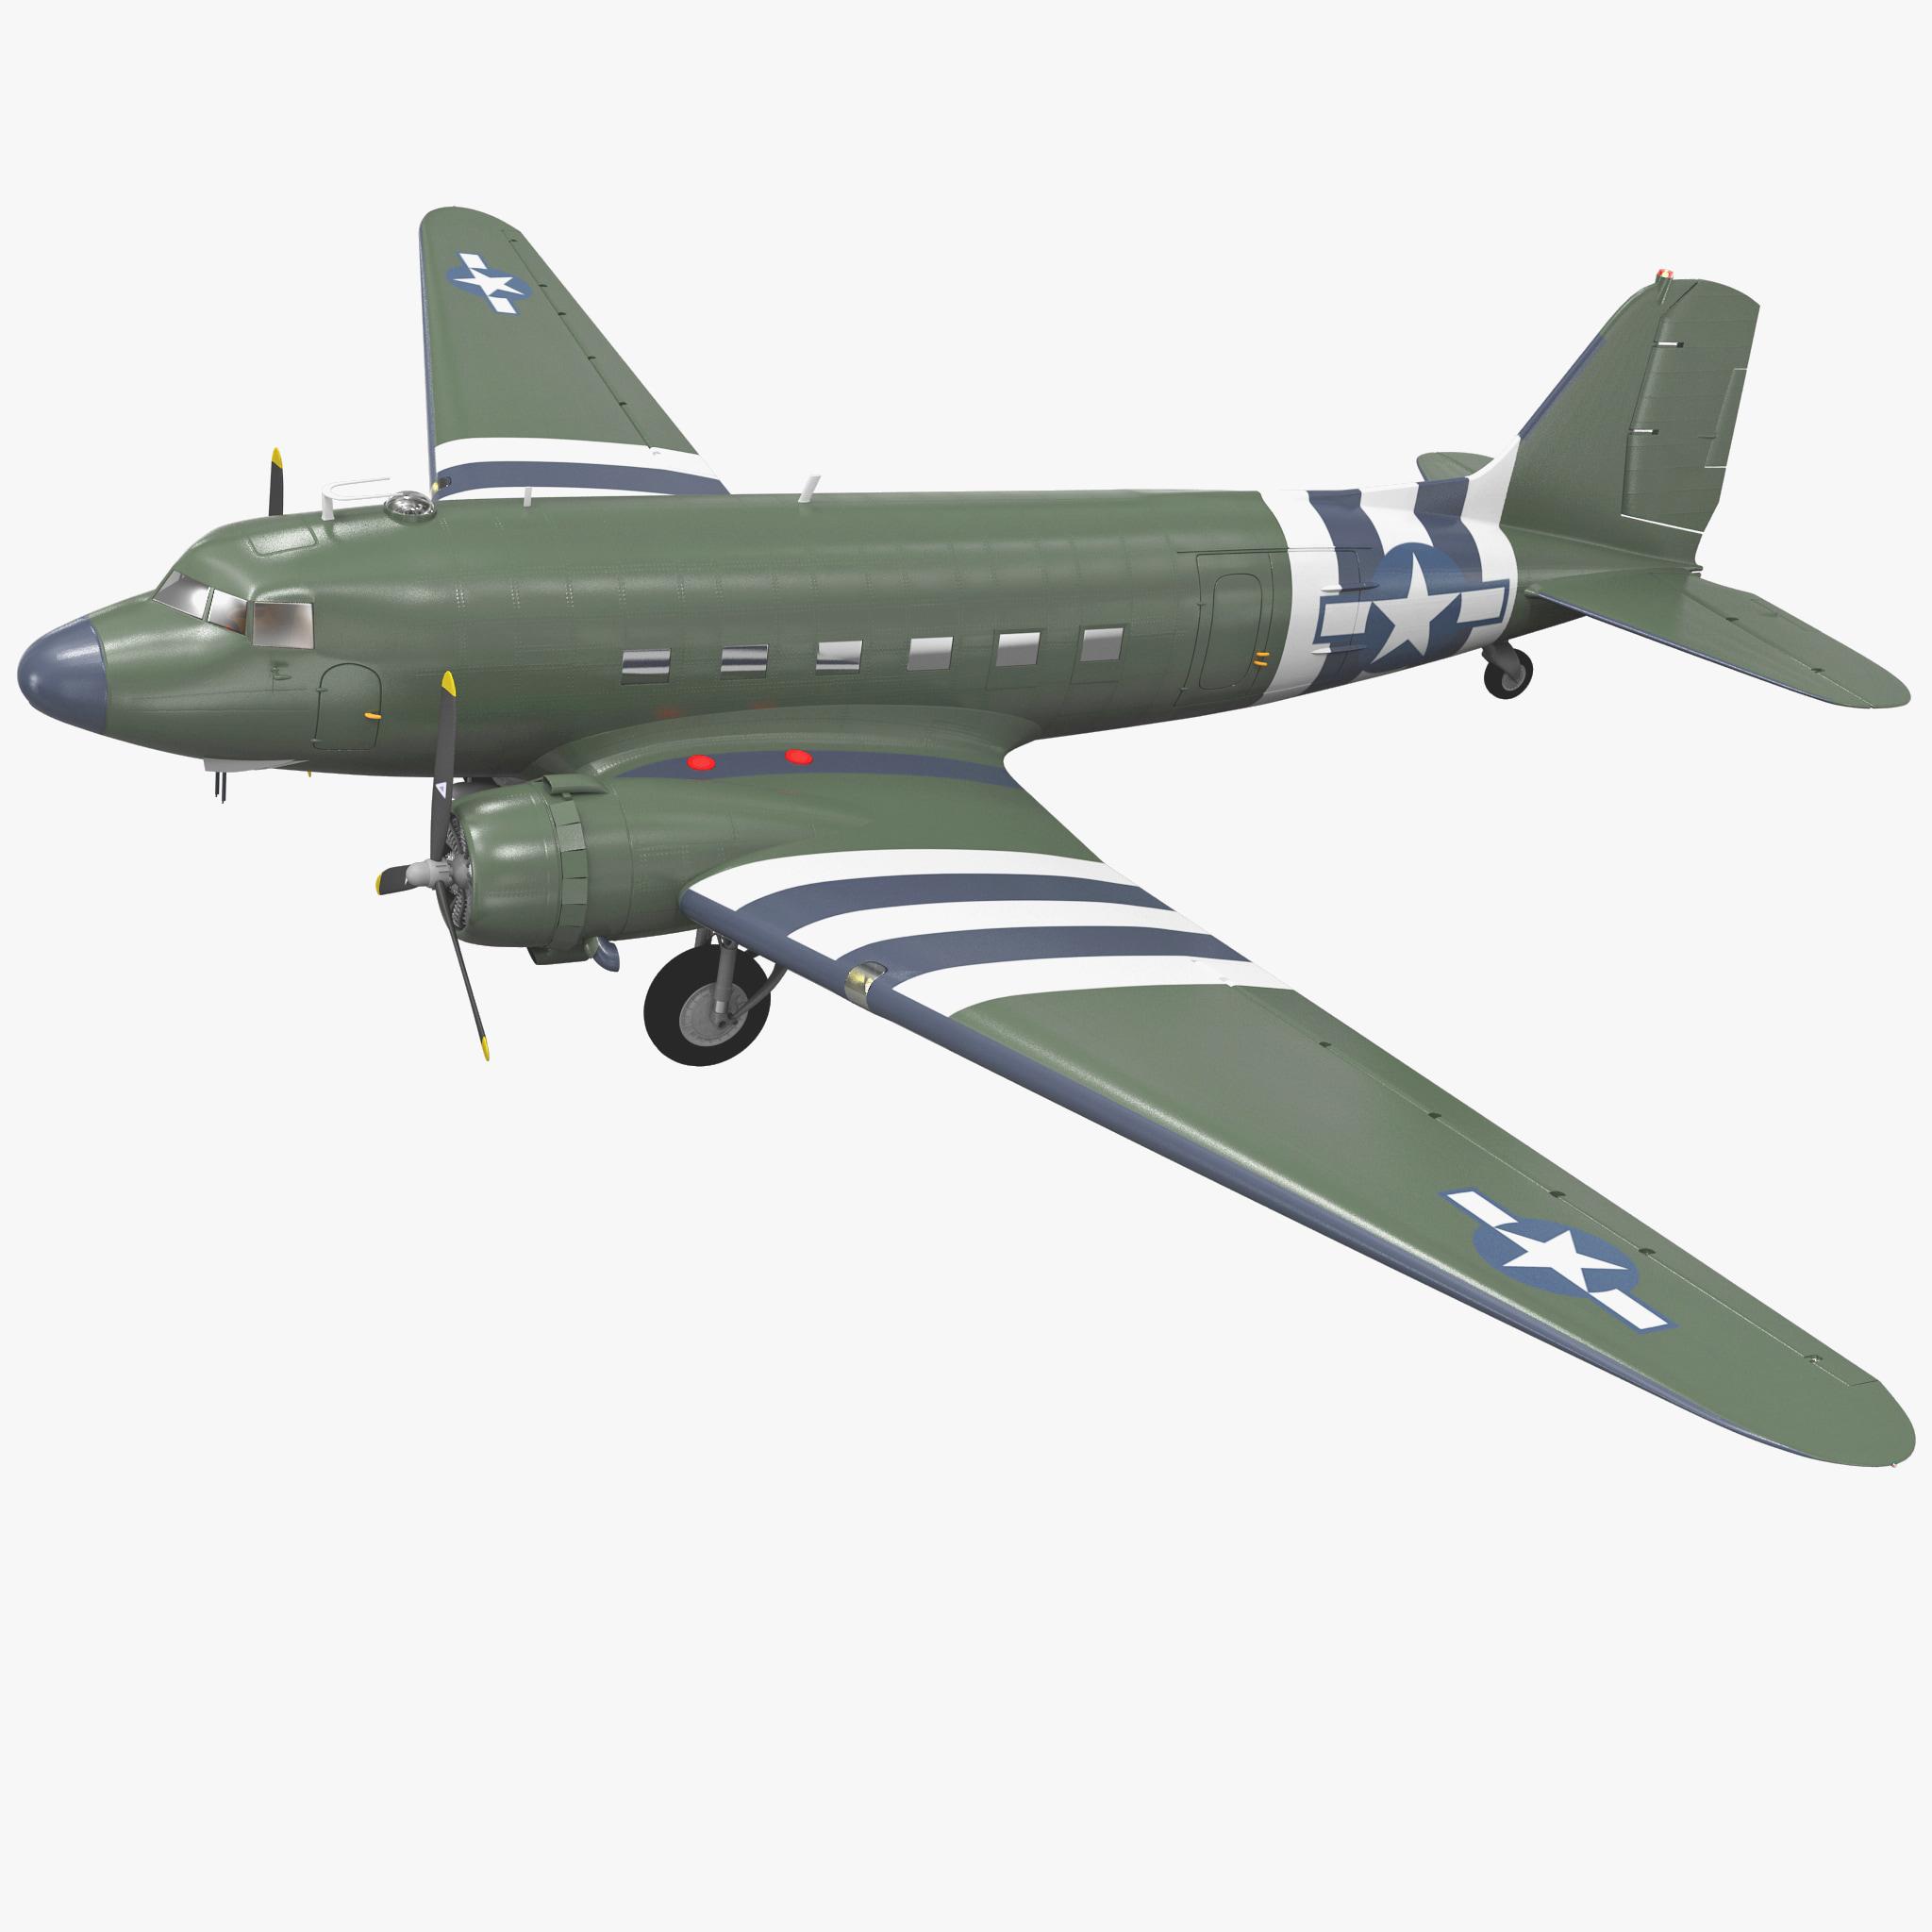 Military Transport Aircraft Douglas C-47 Skytrain_1.jpg